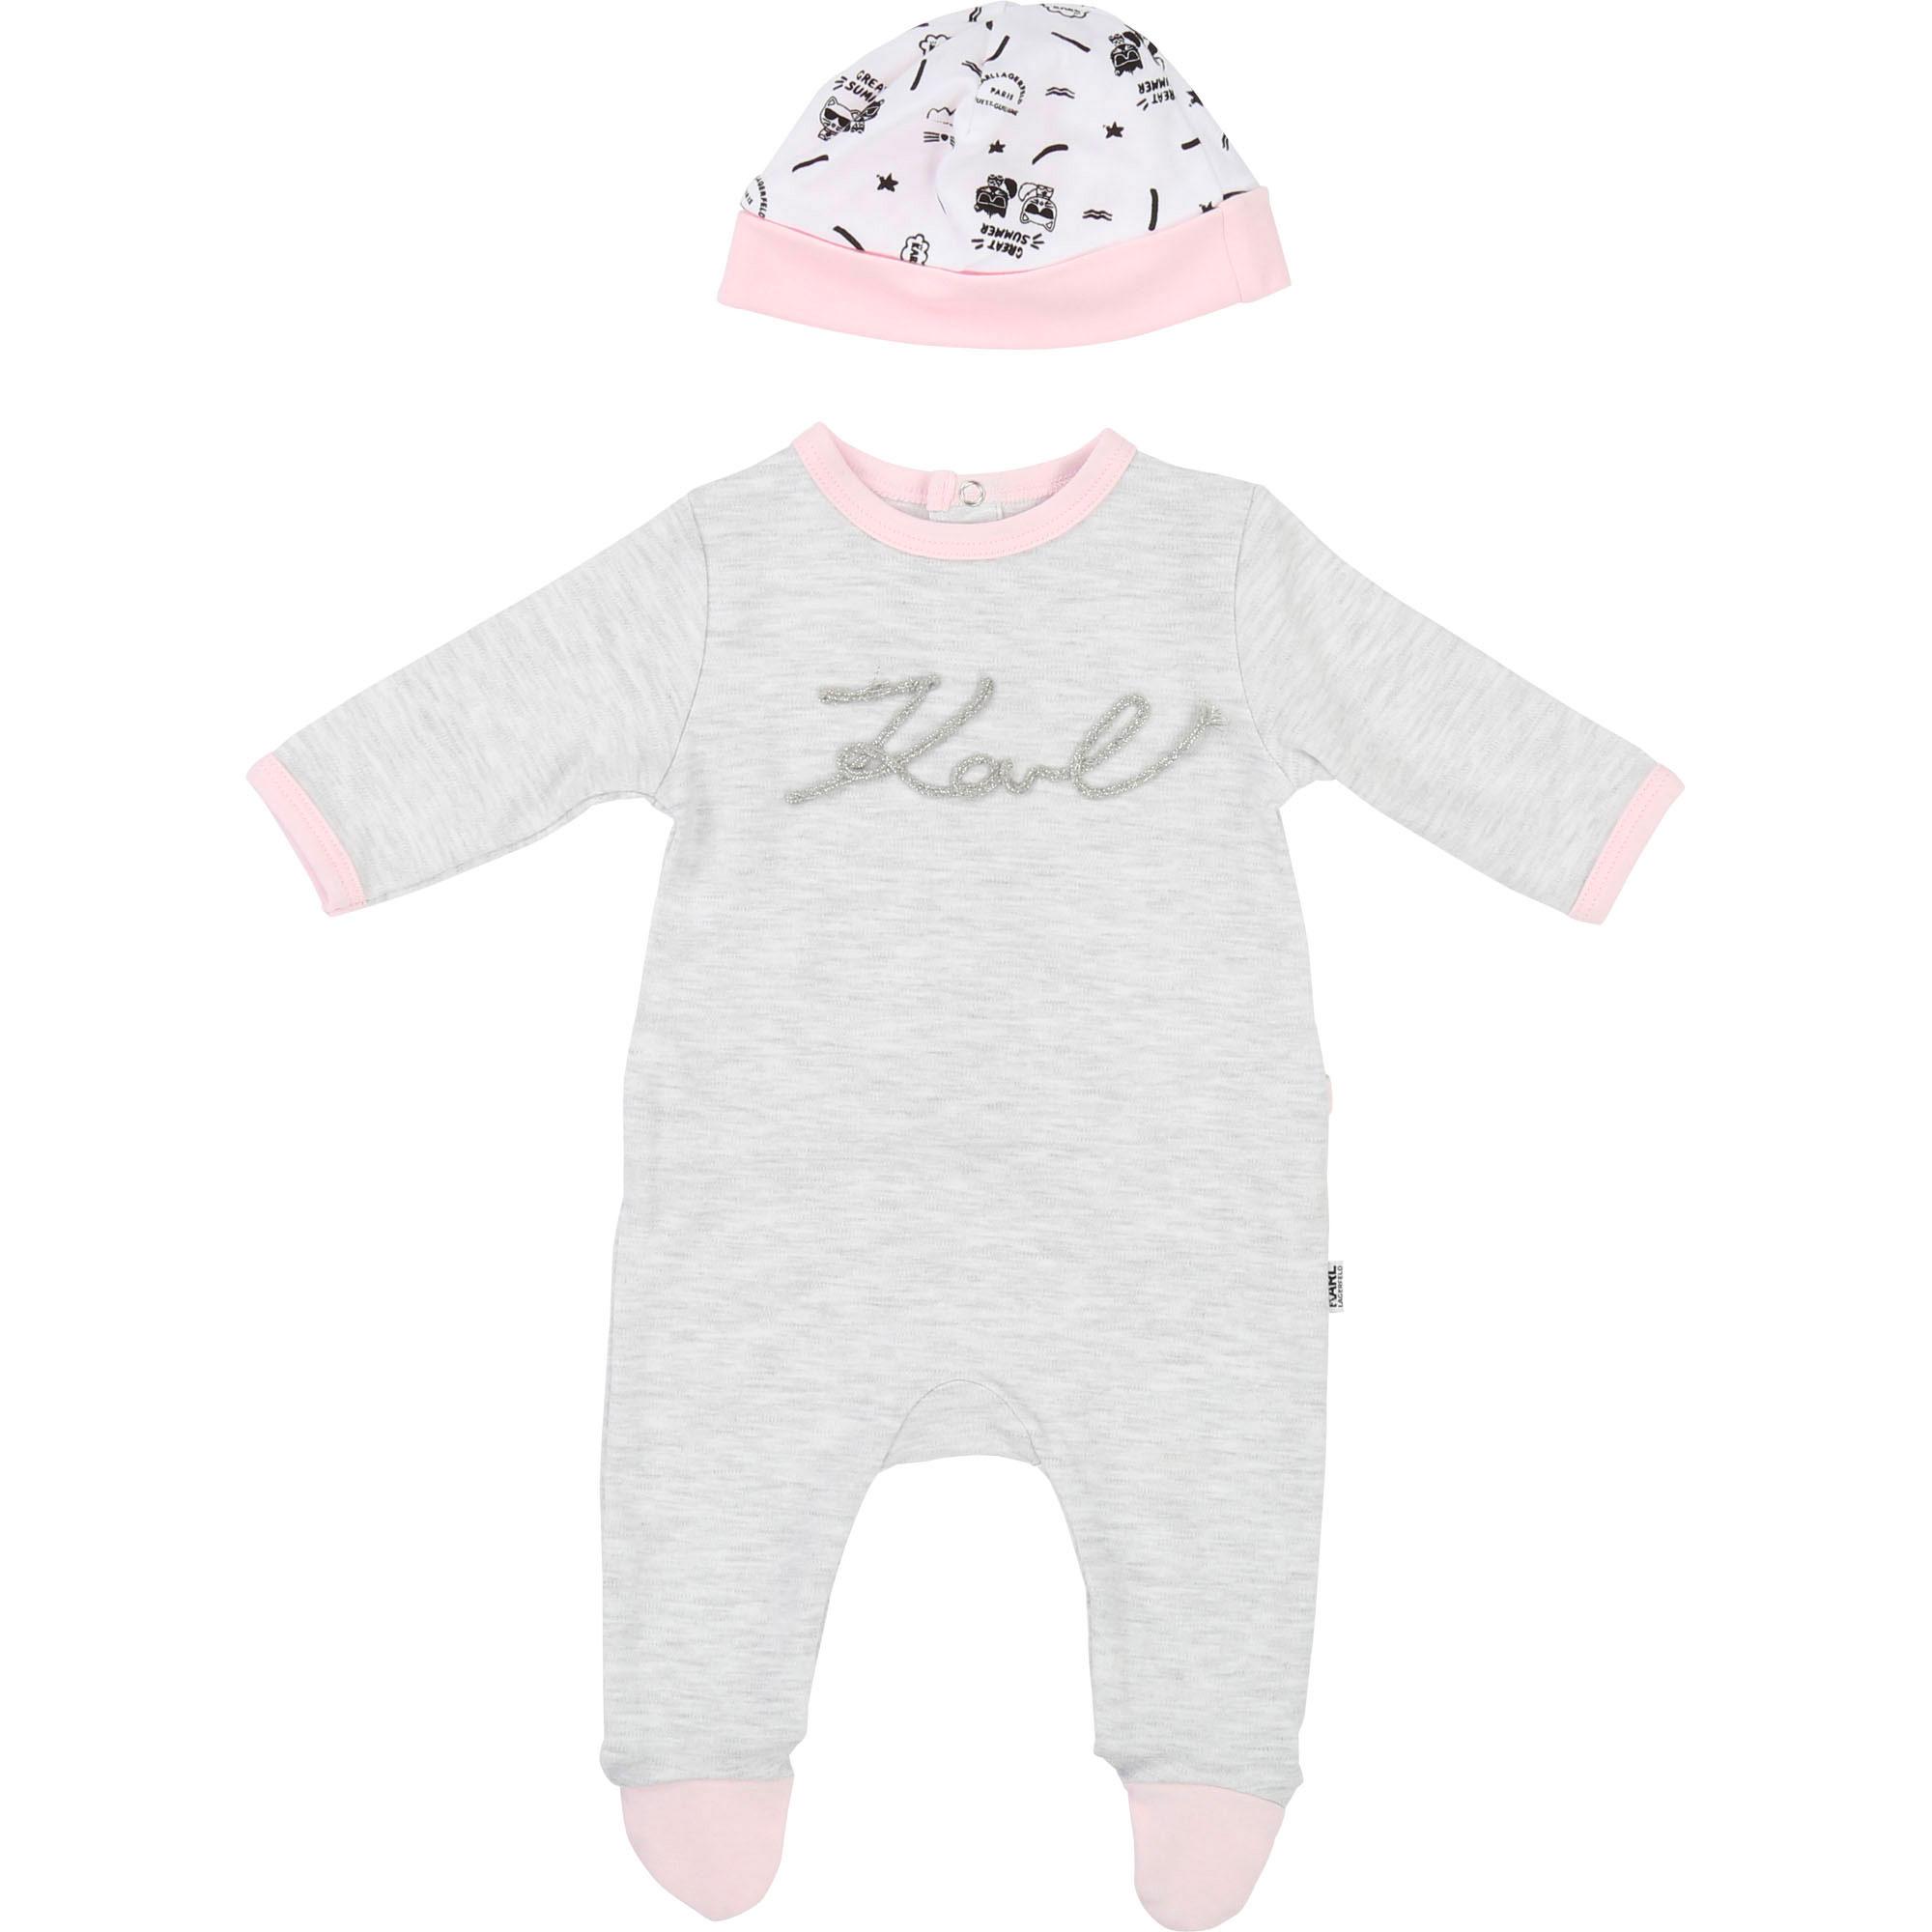 Pyjama et bonnet en interlock KARL LAGERFELD KIDS BEBE COUCHE UNISEXE Gris